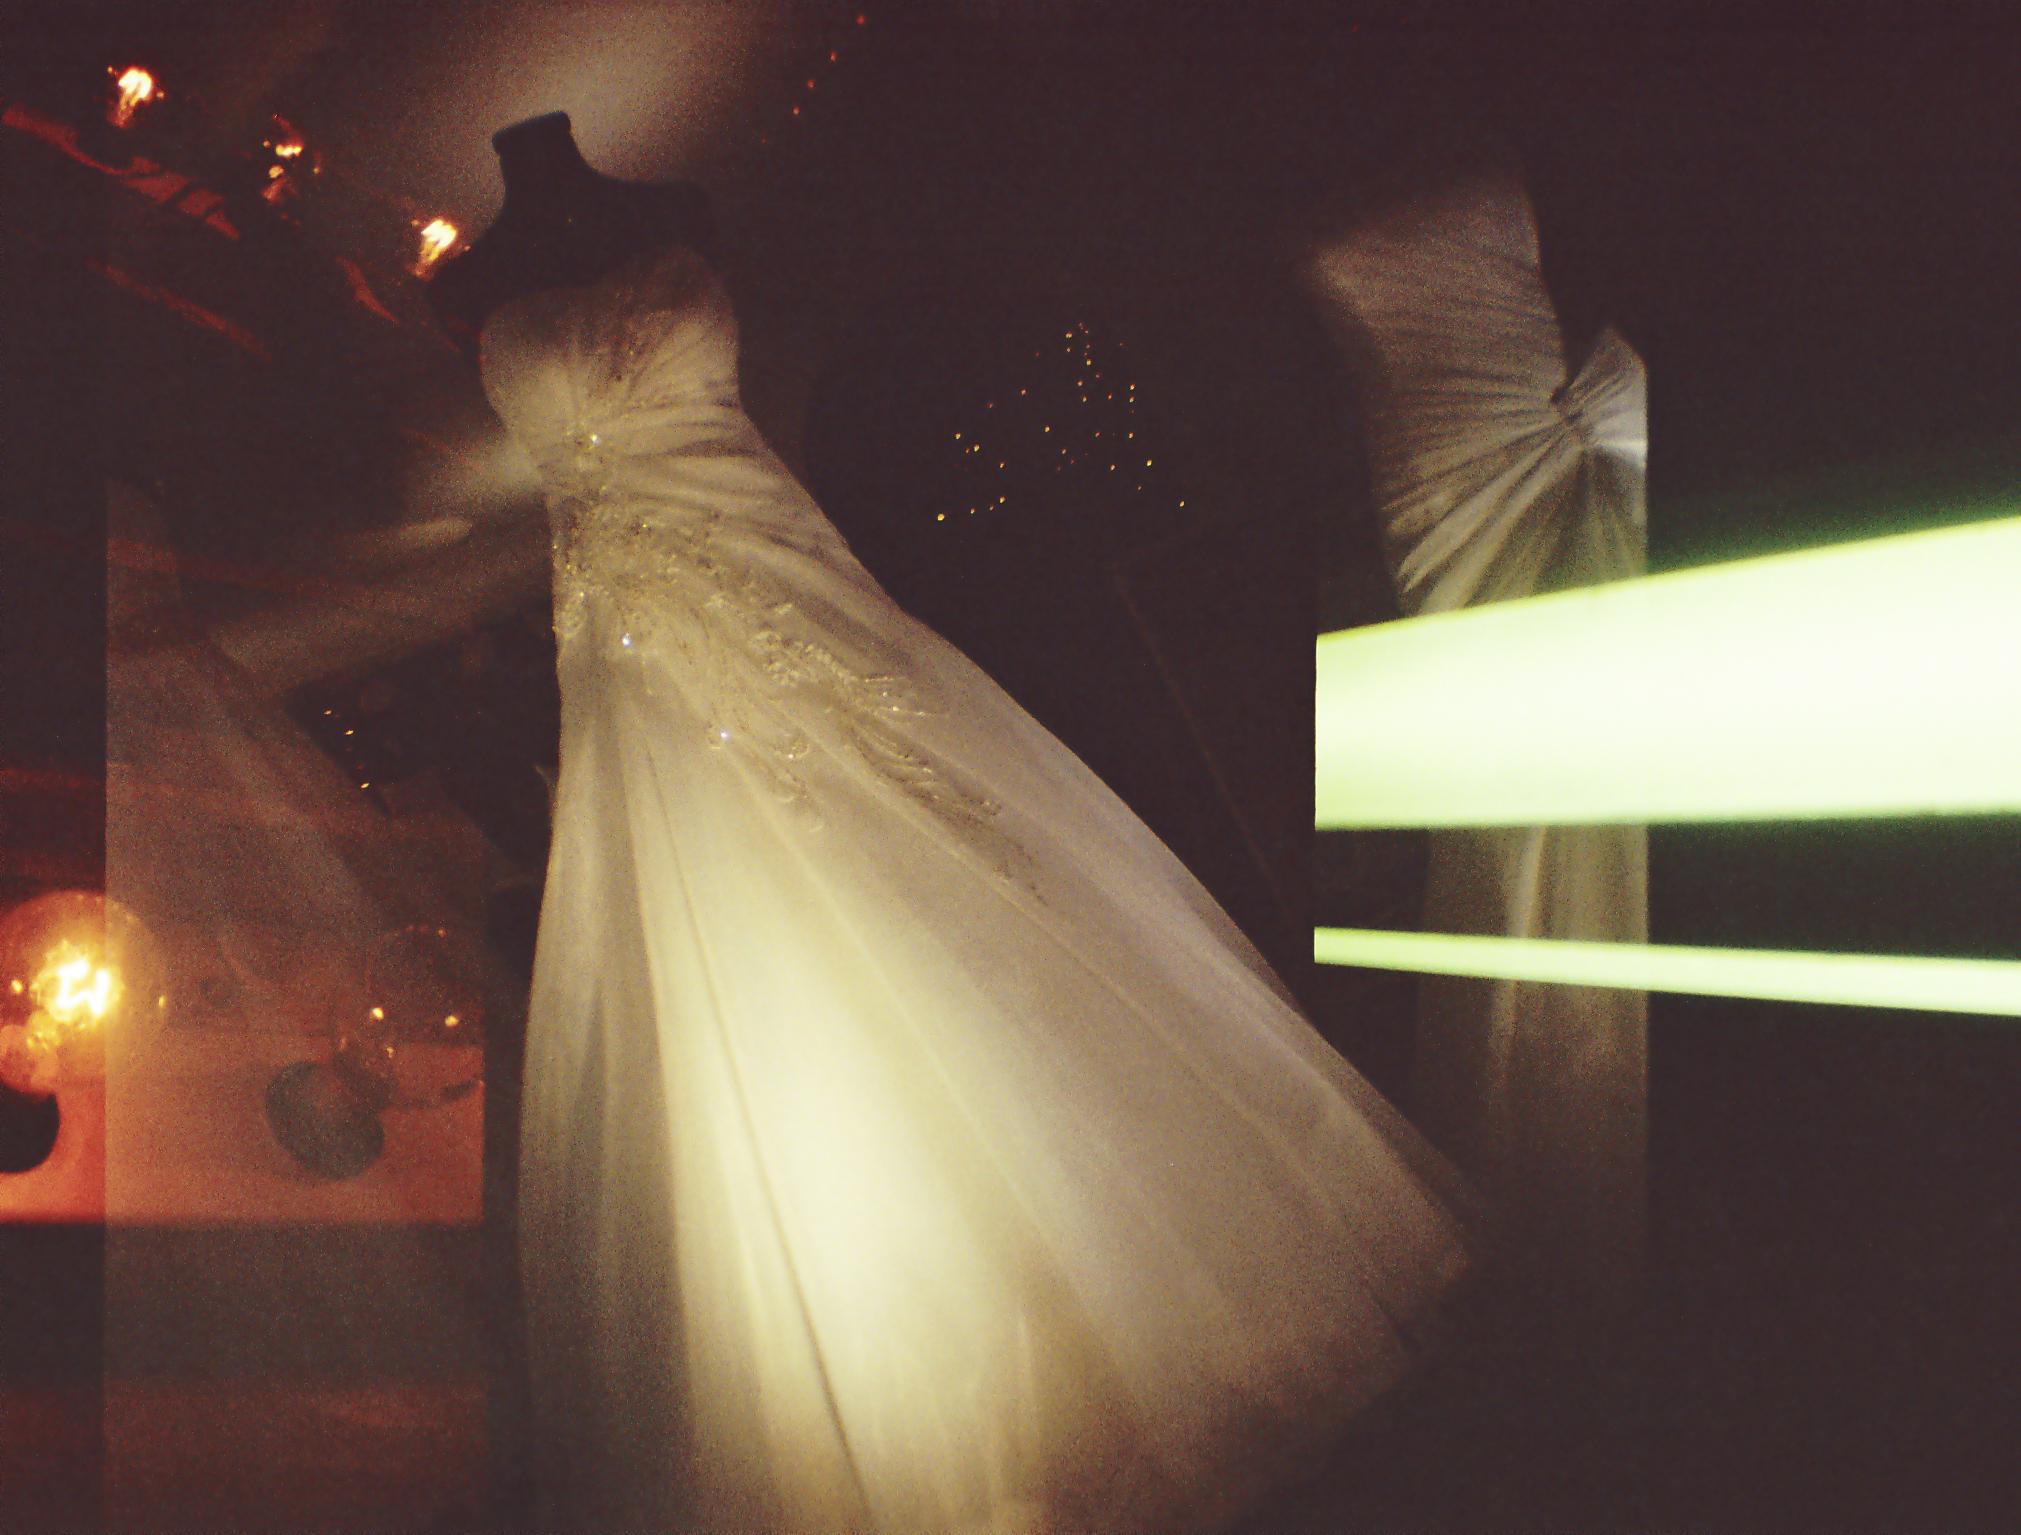 Lomo_Hochzeitskleid.jpg